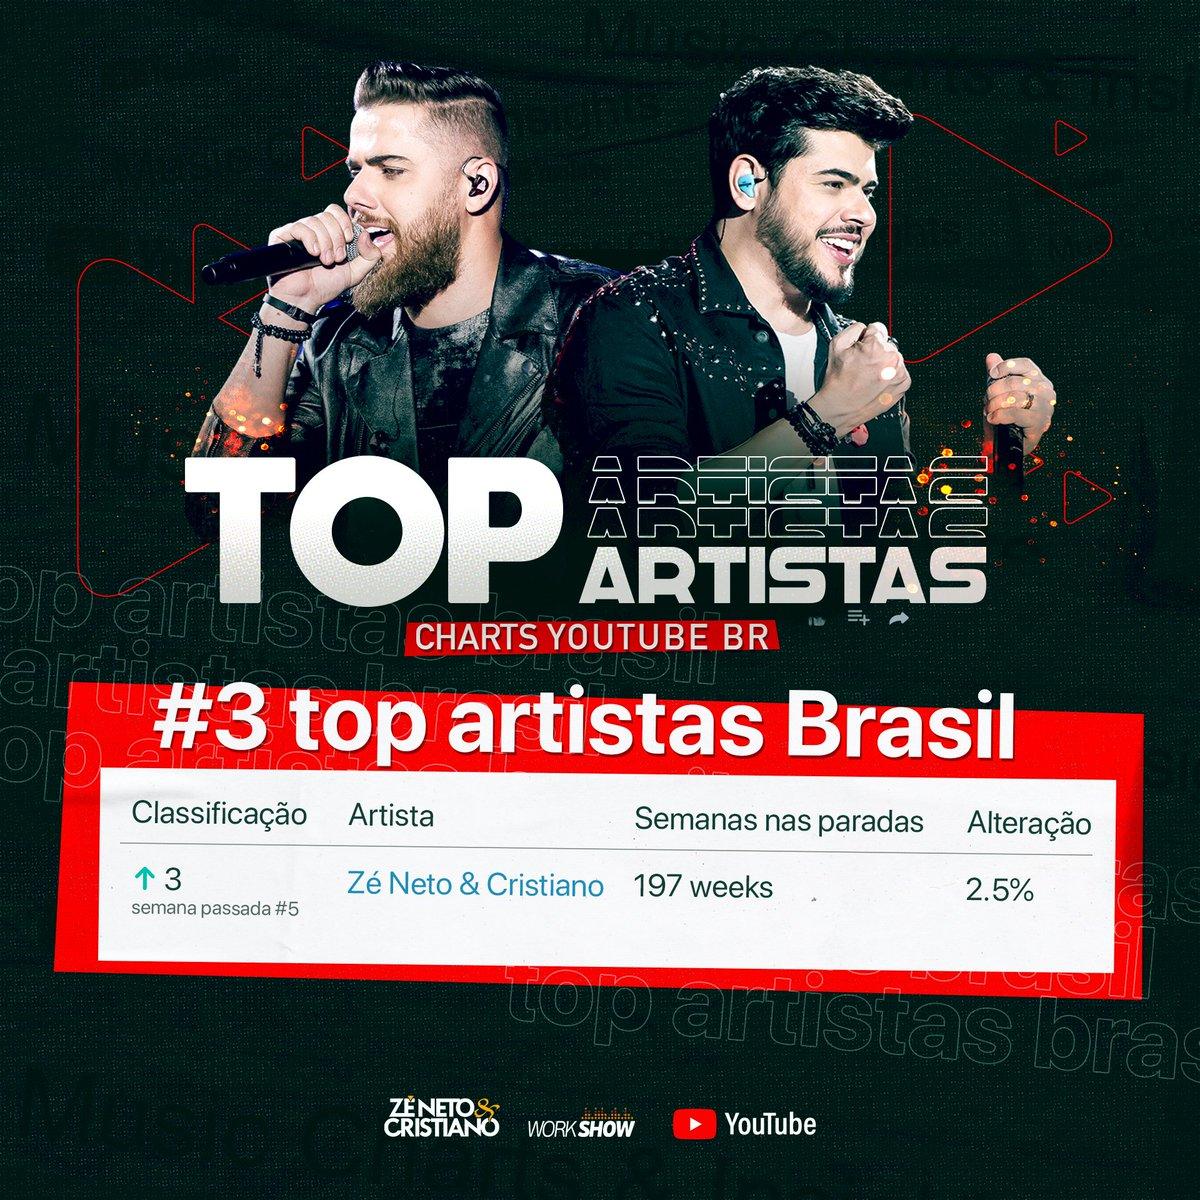 Galera somos o 3º no TOP ARTISTAS mais assistidos no @YoutubeBrasil! Bora comemorar galeeeeera!!! Muuuuito obrigado 💥💥💥 Confira clicando no link 👉 https://t.co/jinHSmWpQB  #zenetoecristiano #dvdpormaisbeijosaovivo #musicasertaneja #musica #fãs #fã #fans #fan #fanfic https://t.co/RkTbtMuWH3